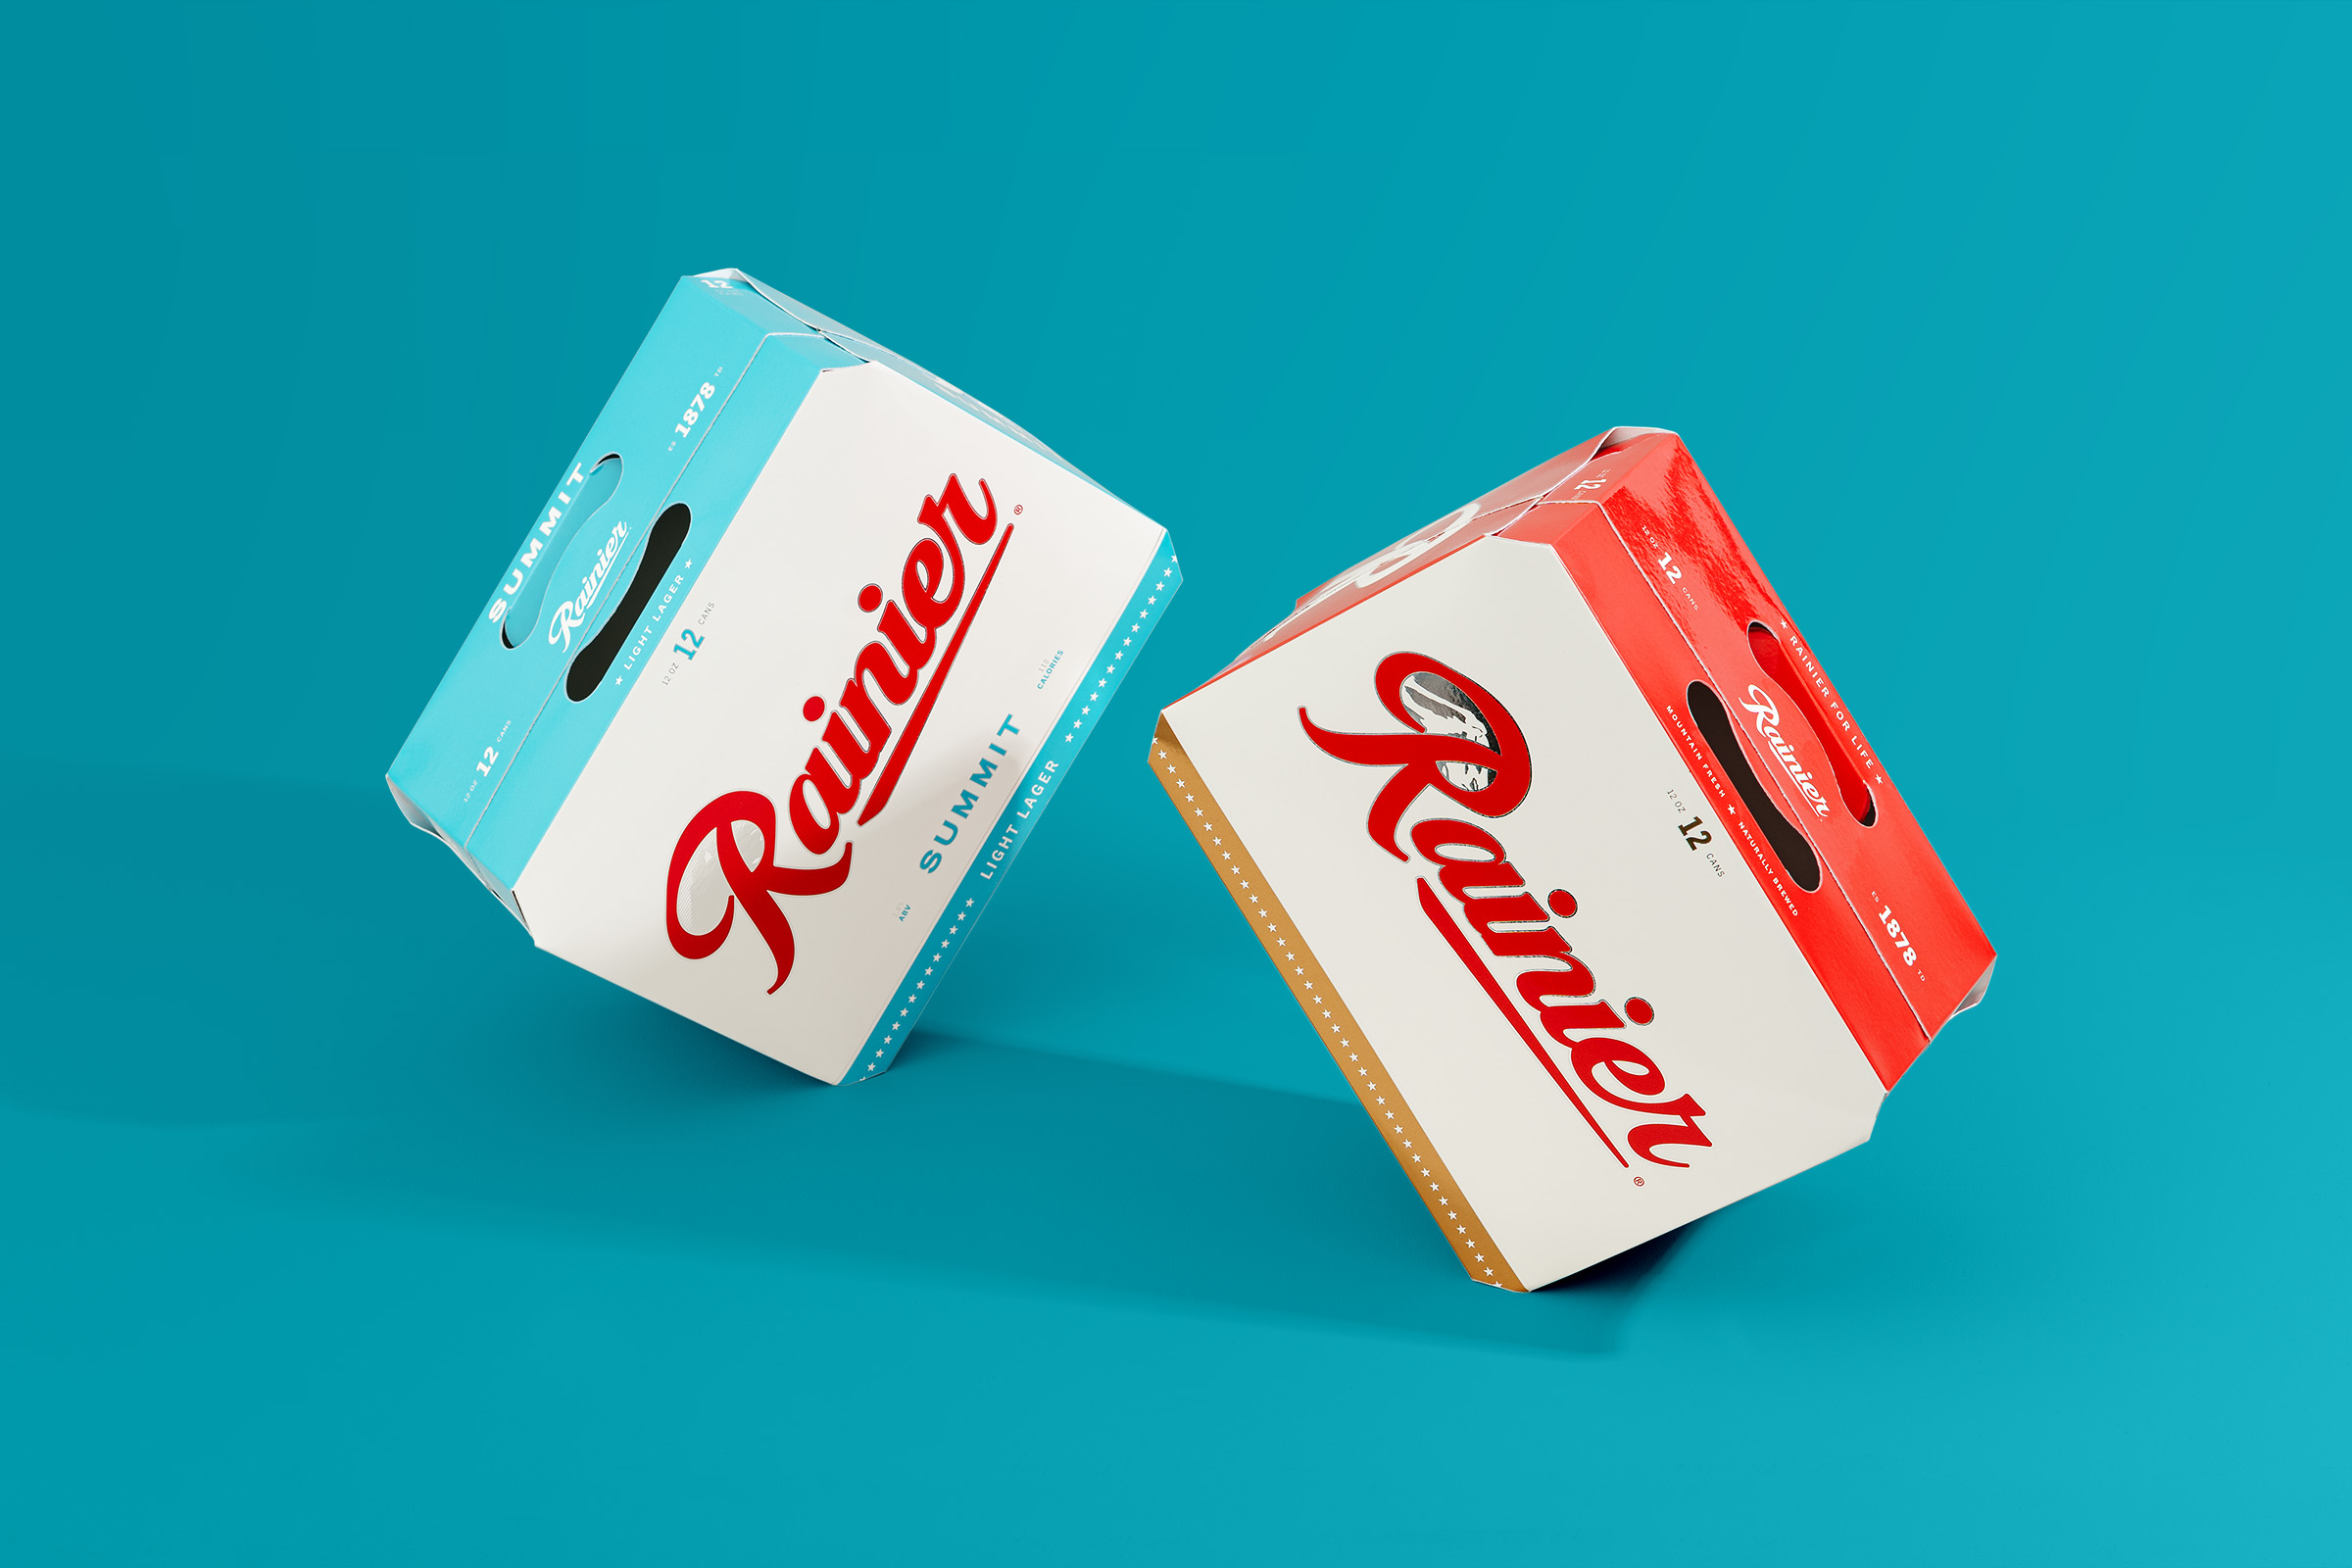 parliament-rainier-12-pack-boxs-01-web.jpg